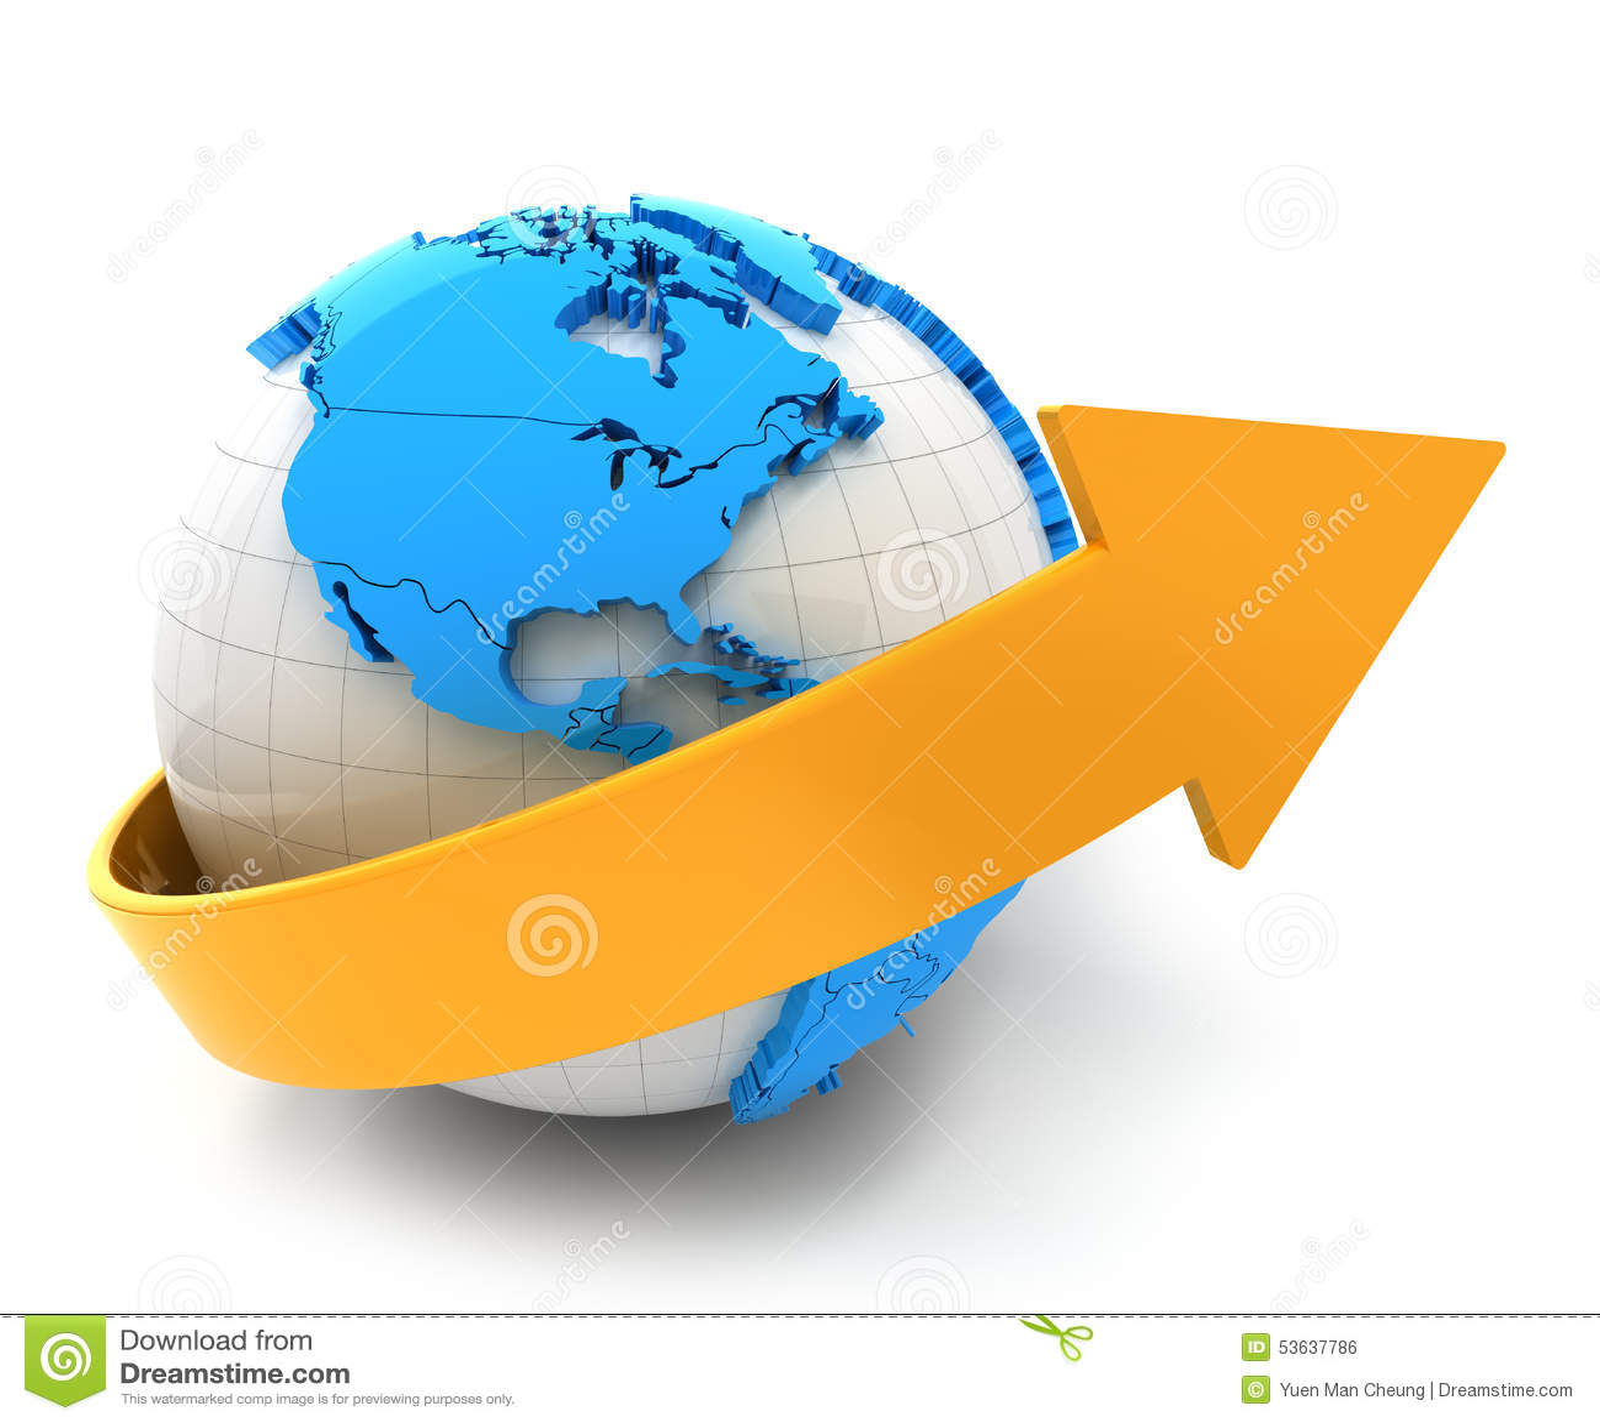 Global Growth Stock Illustration - Image: 53637786